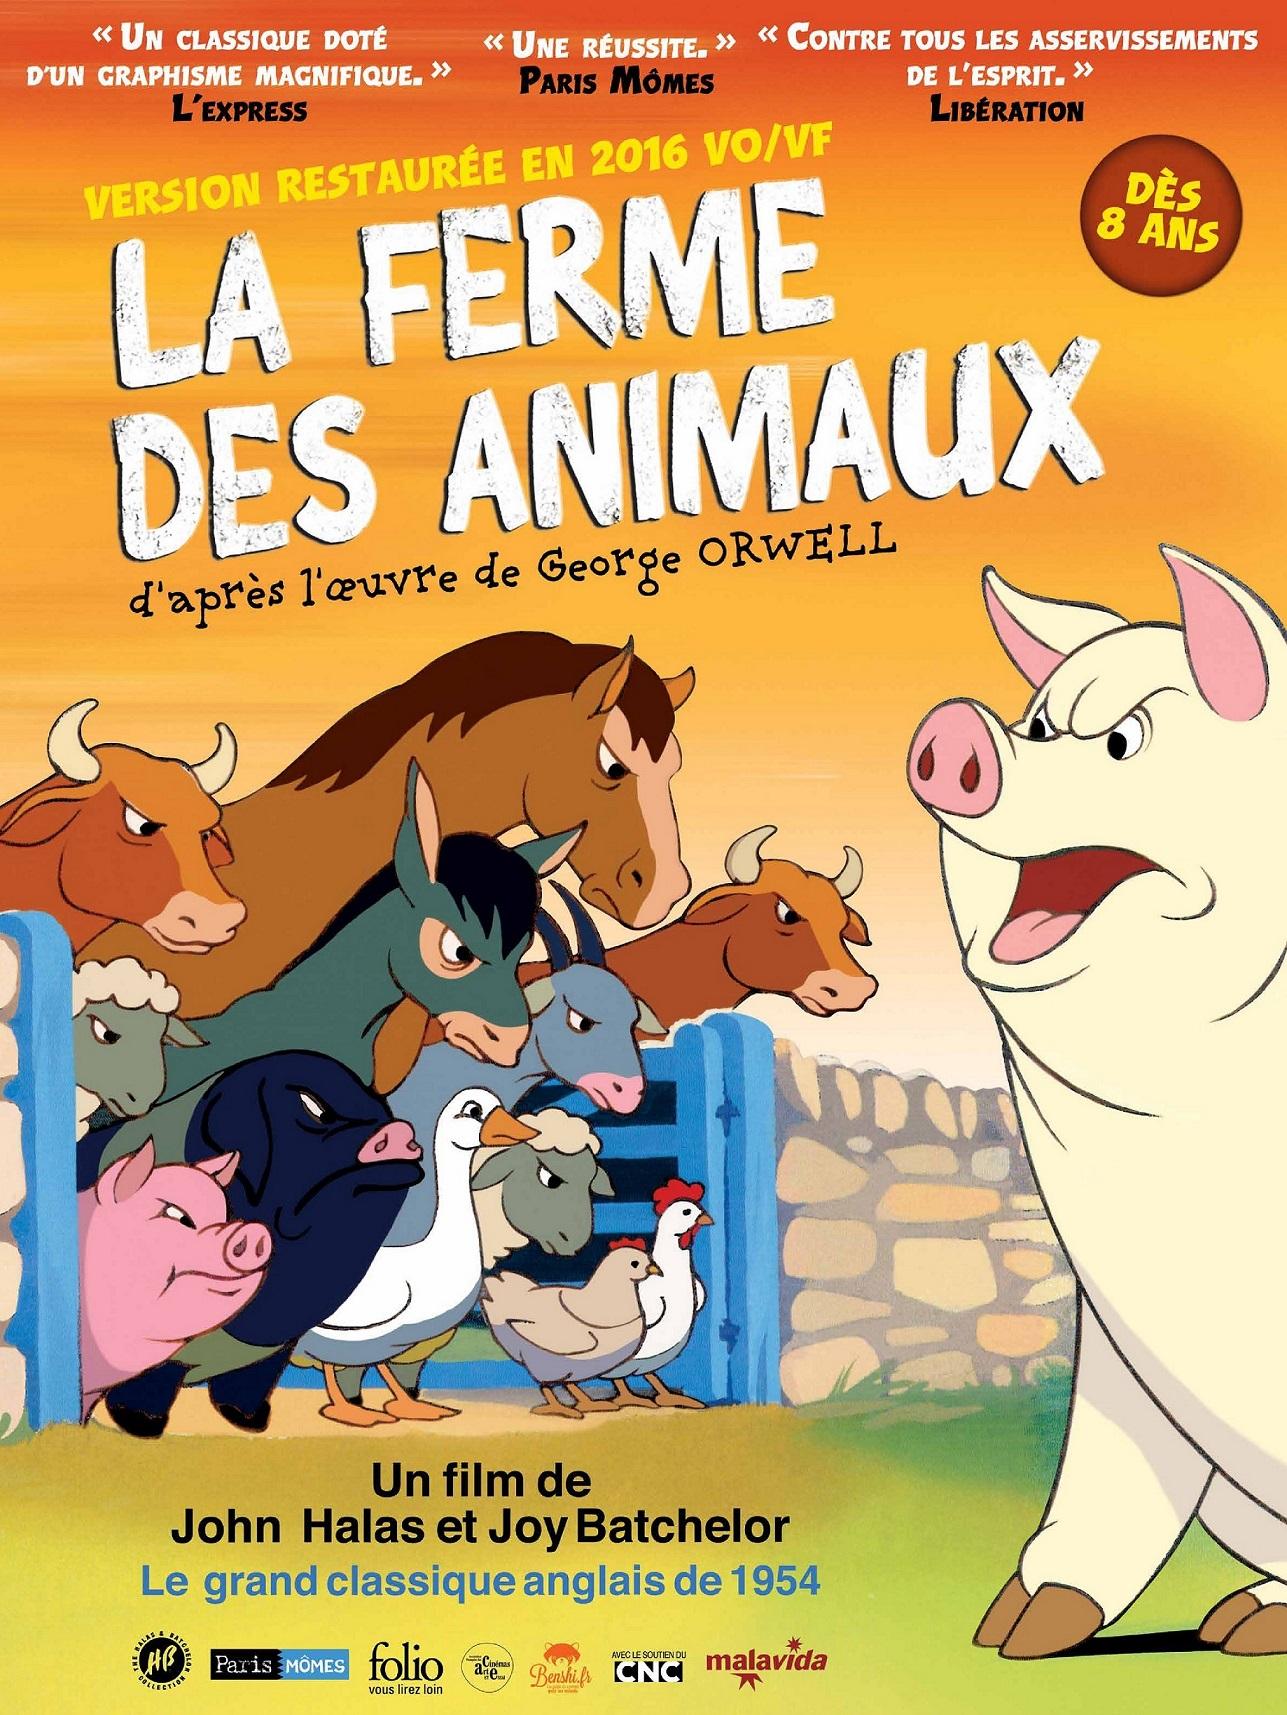 http://www.festival-playitagain.com/film/la-ferme-des-animaux/